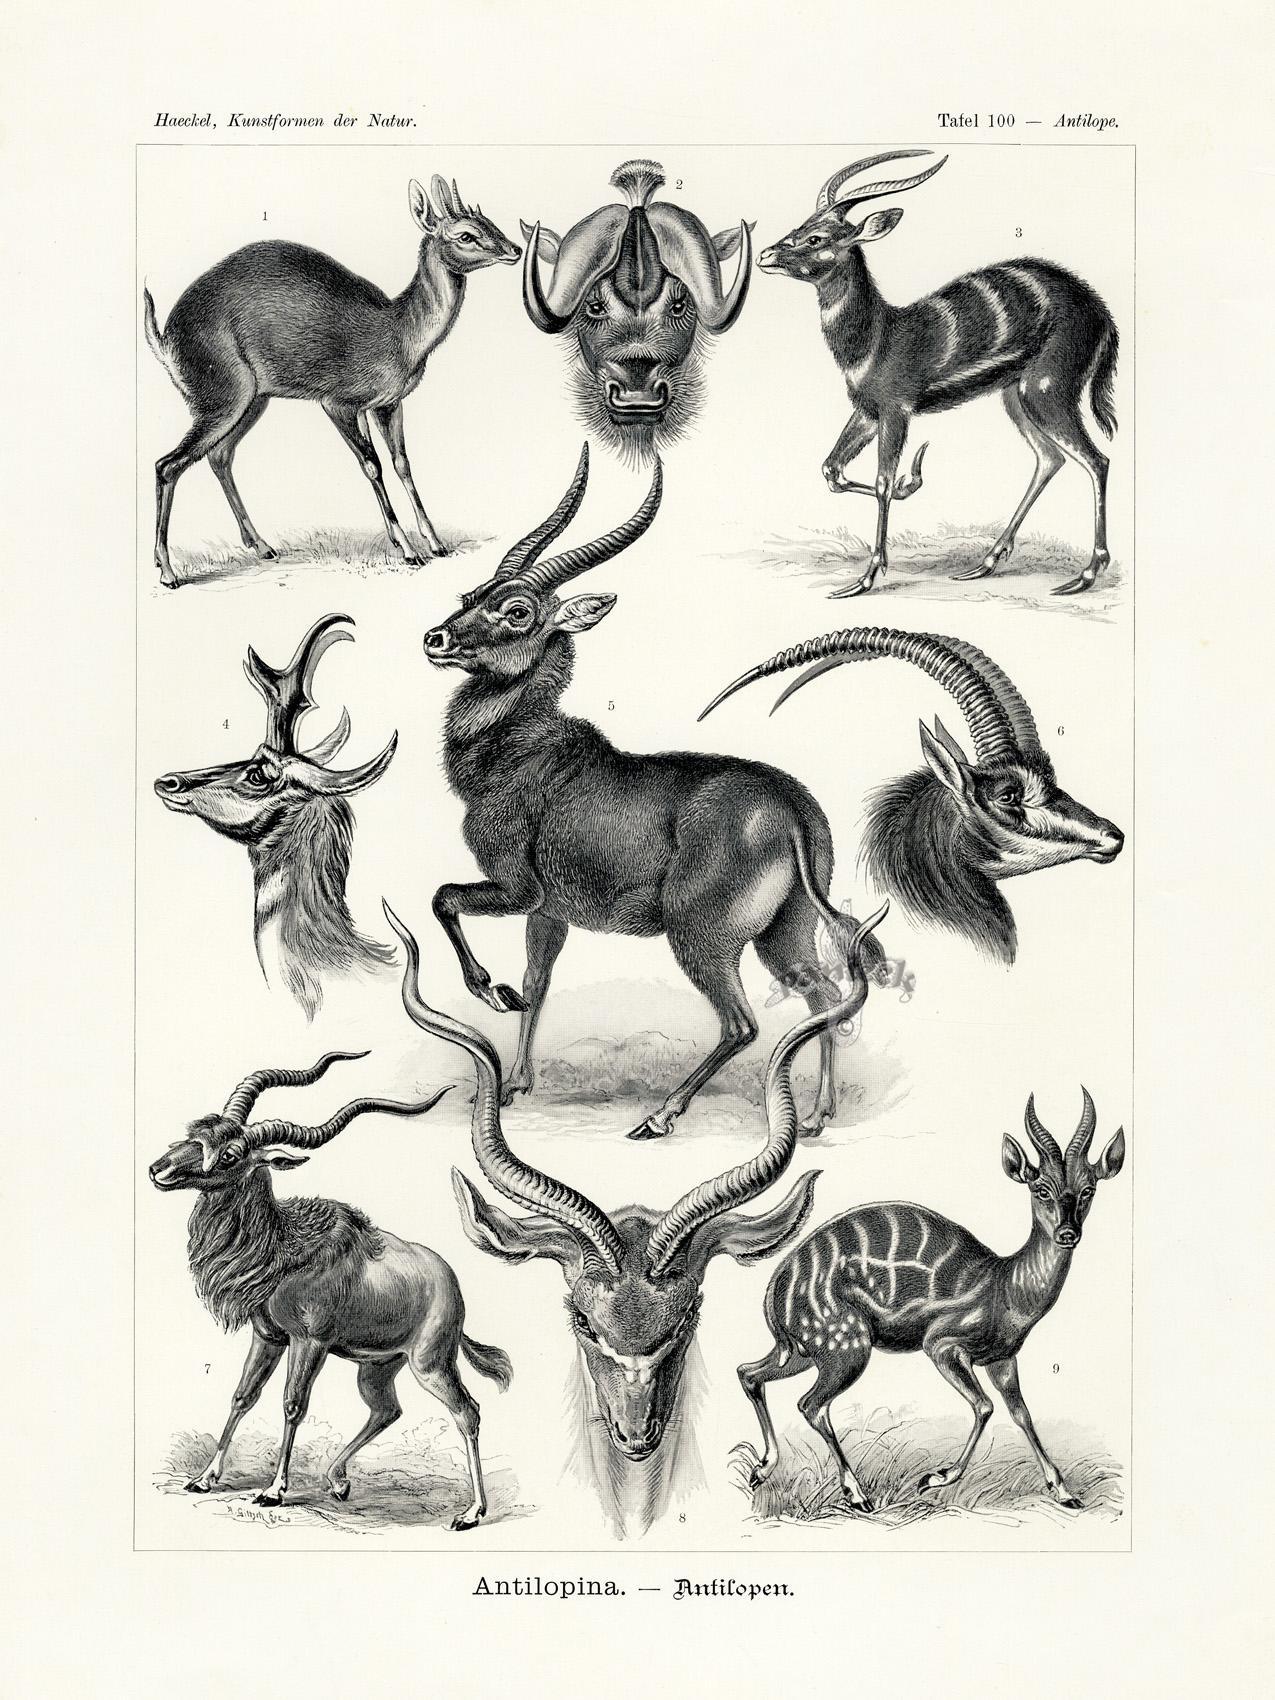 Antilopina, Antelope from Haeckel Antique Prints 1899